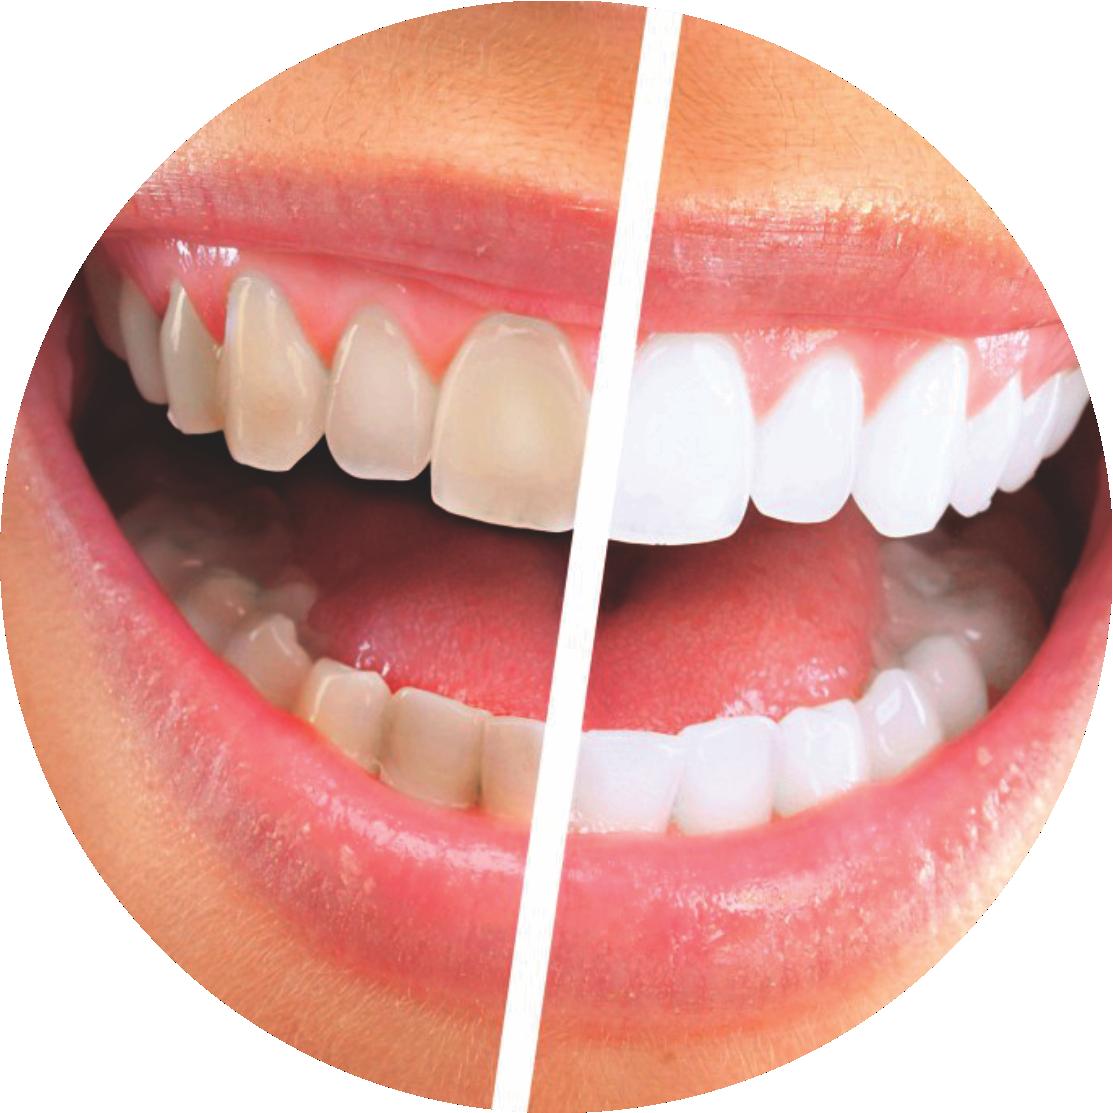 Clareamento dental   Dentes Branco